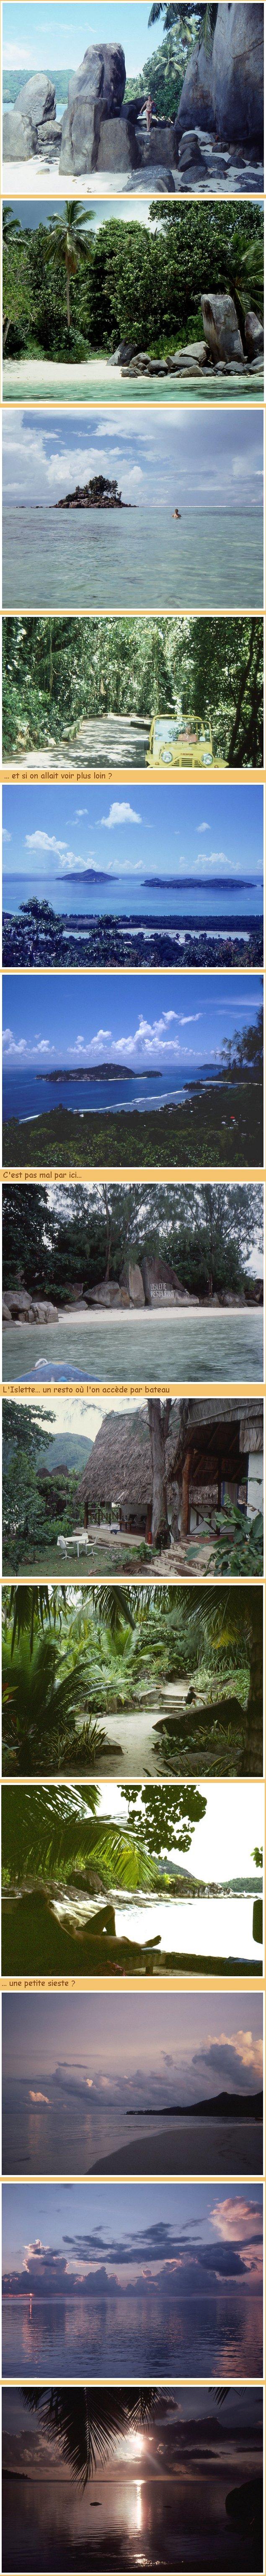 Les Seychelles - 4